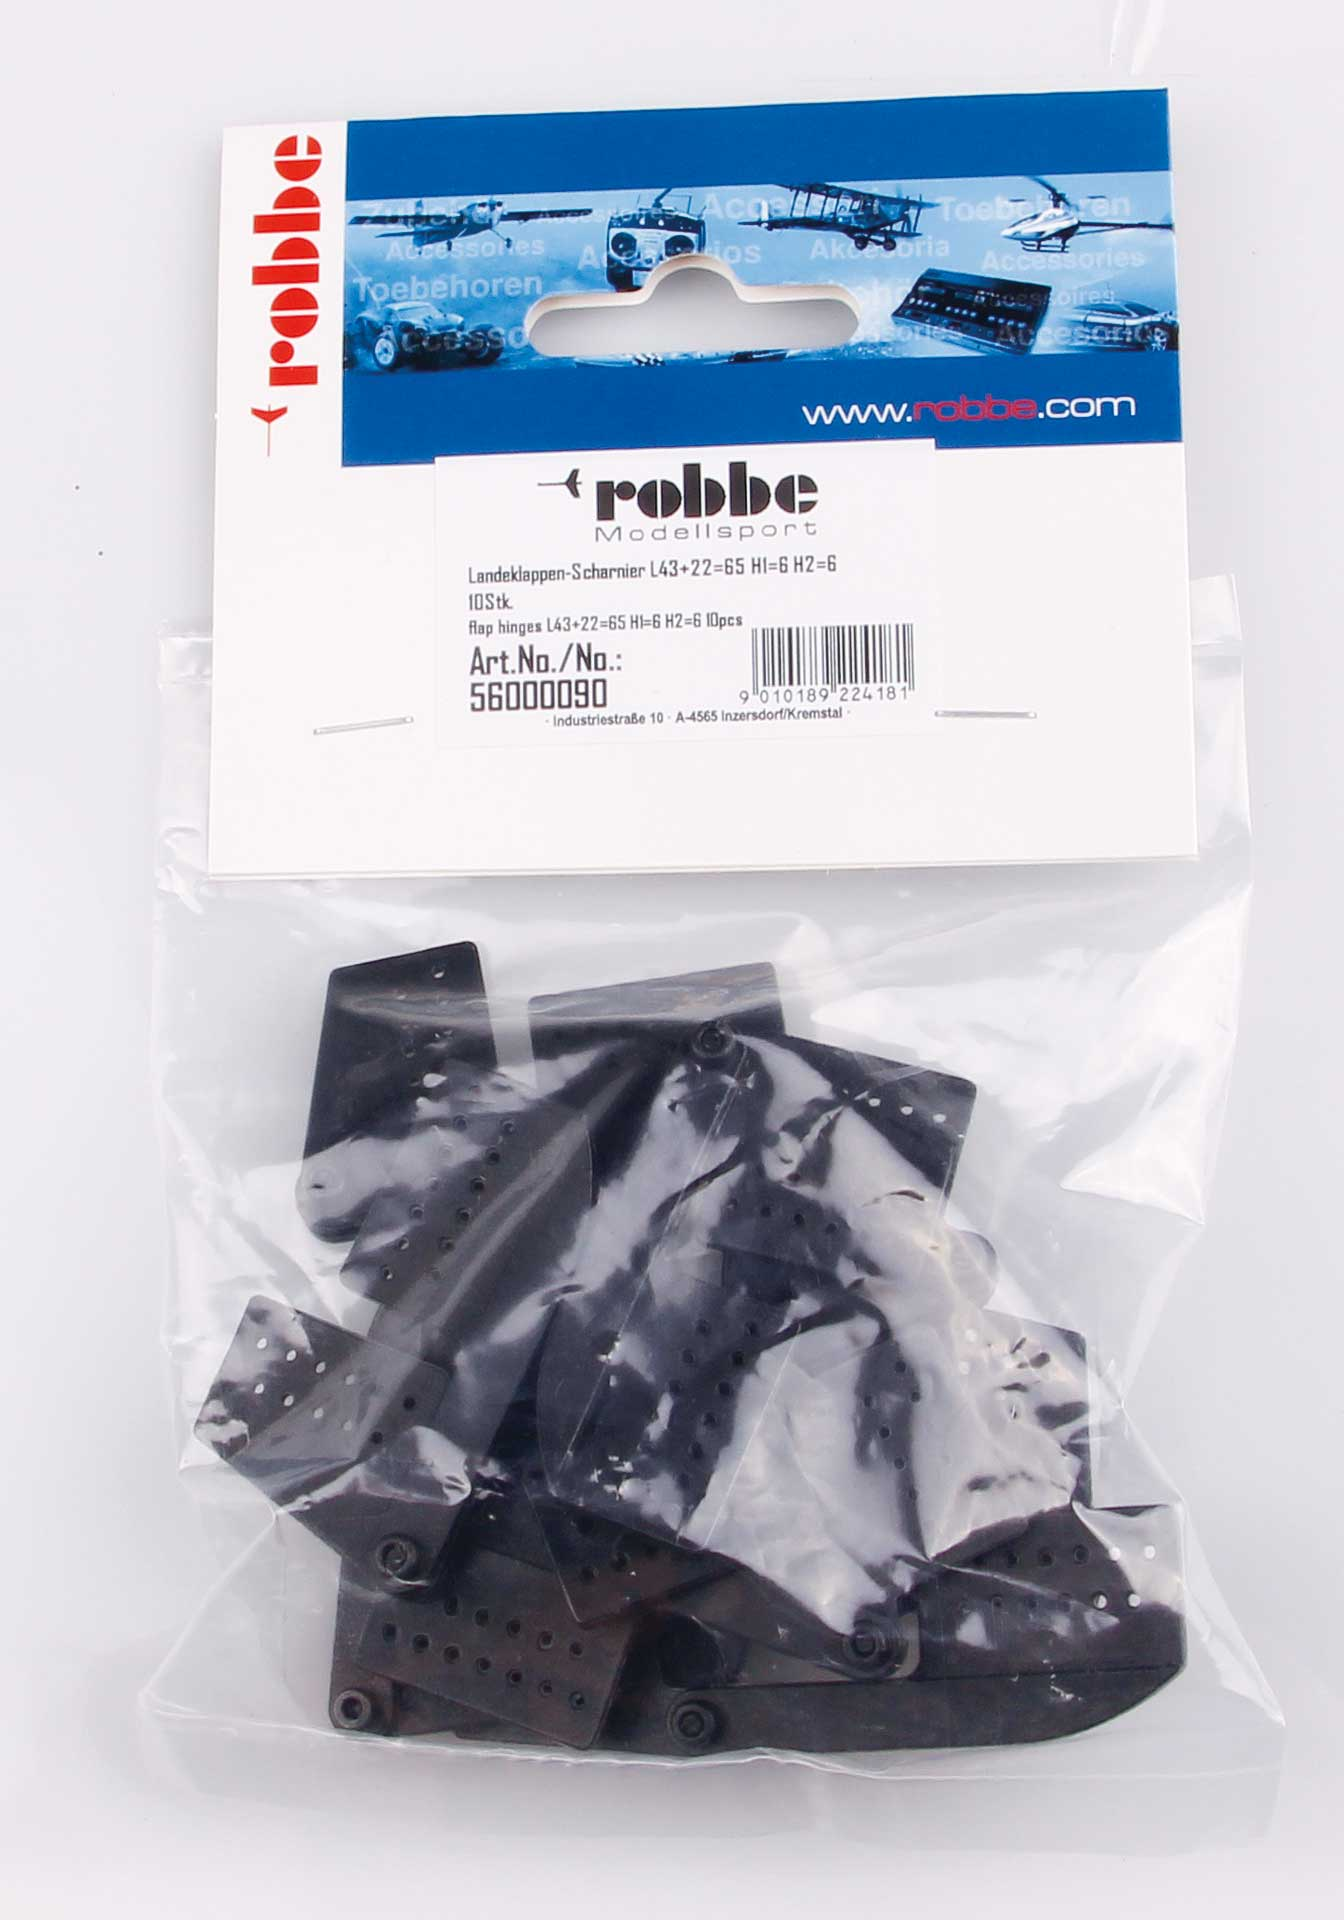 Robbe Modellsport Landeklappen-Scharnier L65mm schwarz Kunststoff 10Stk.